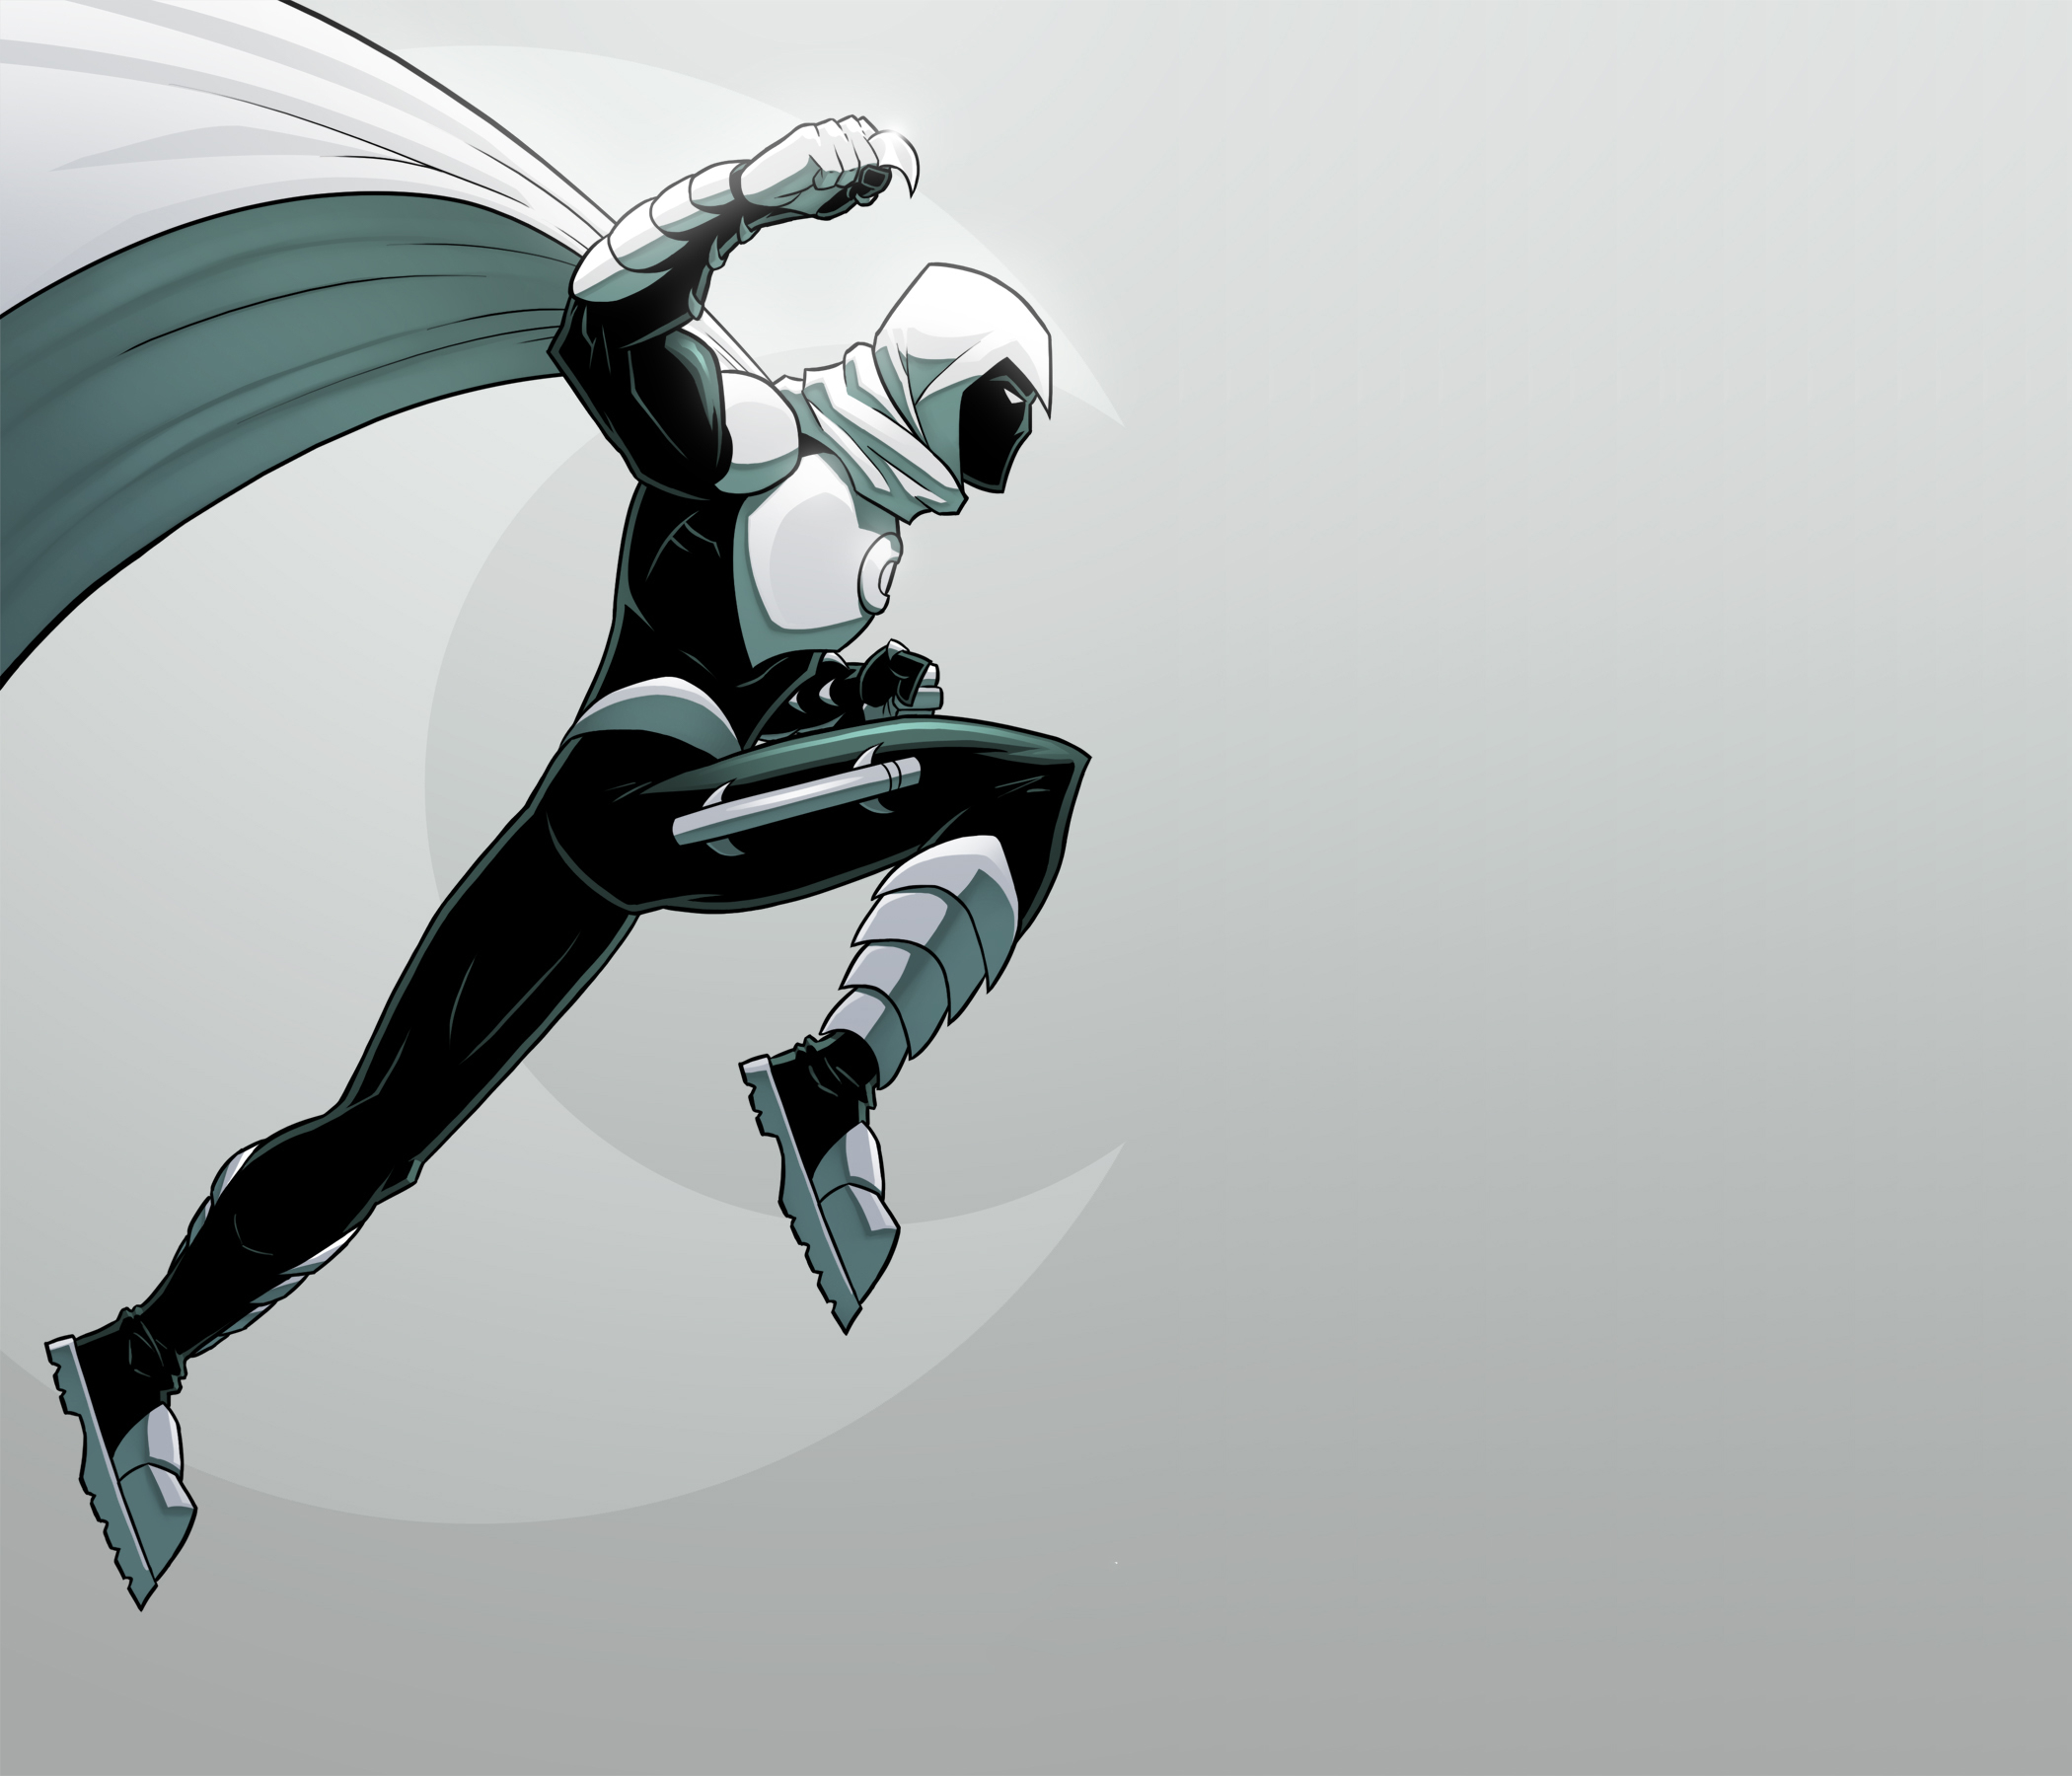 Marvel Moon Knight Wallpaper, HD Superheroes 4K Wallpapers